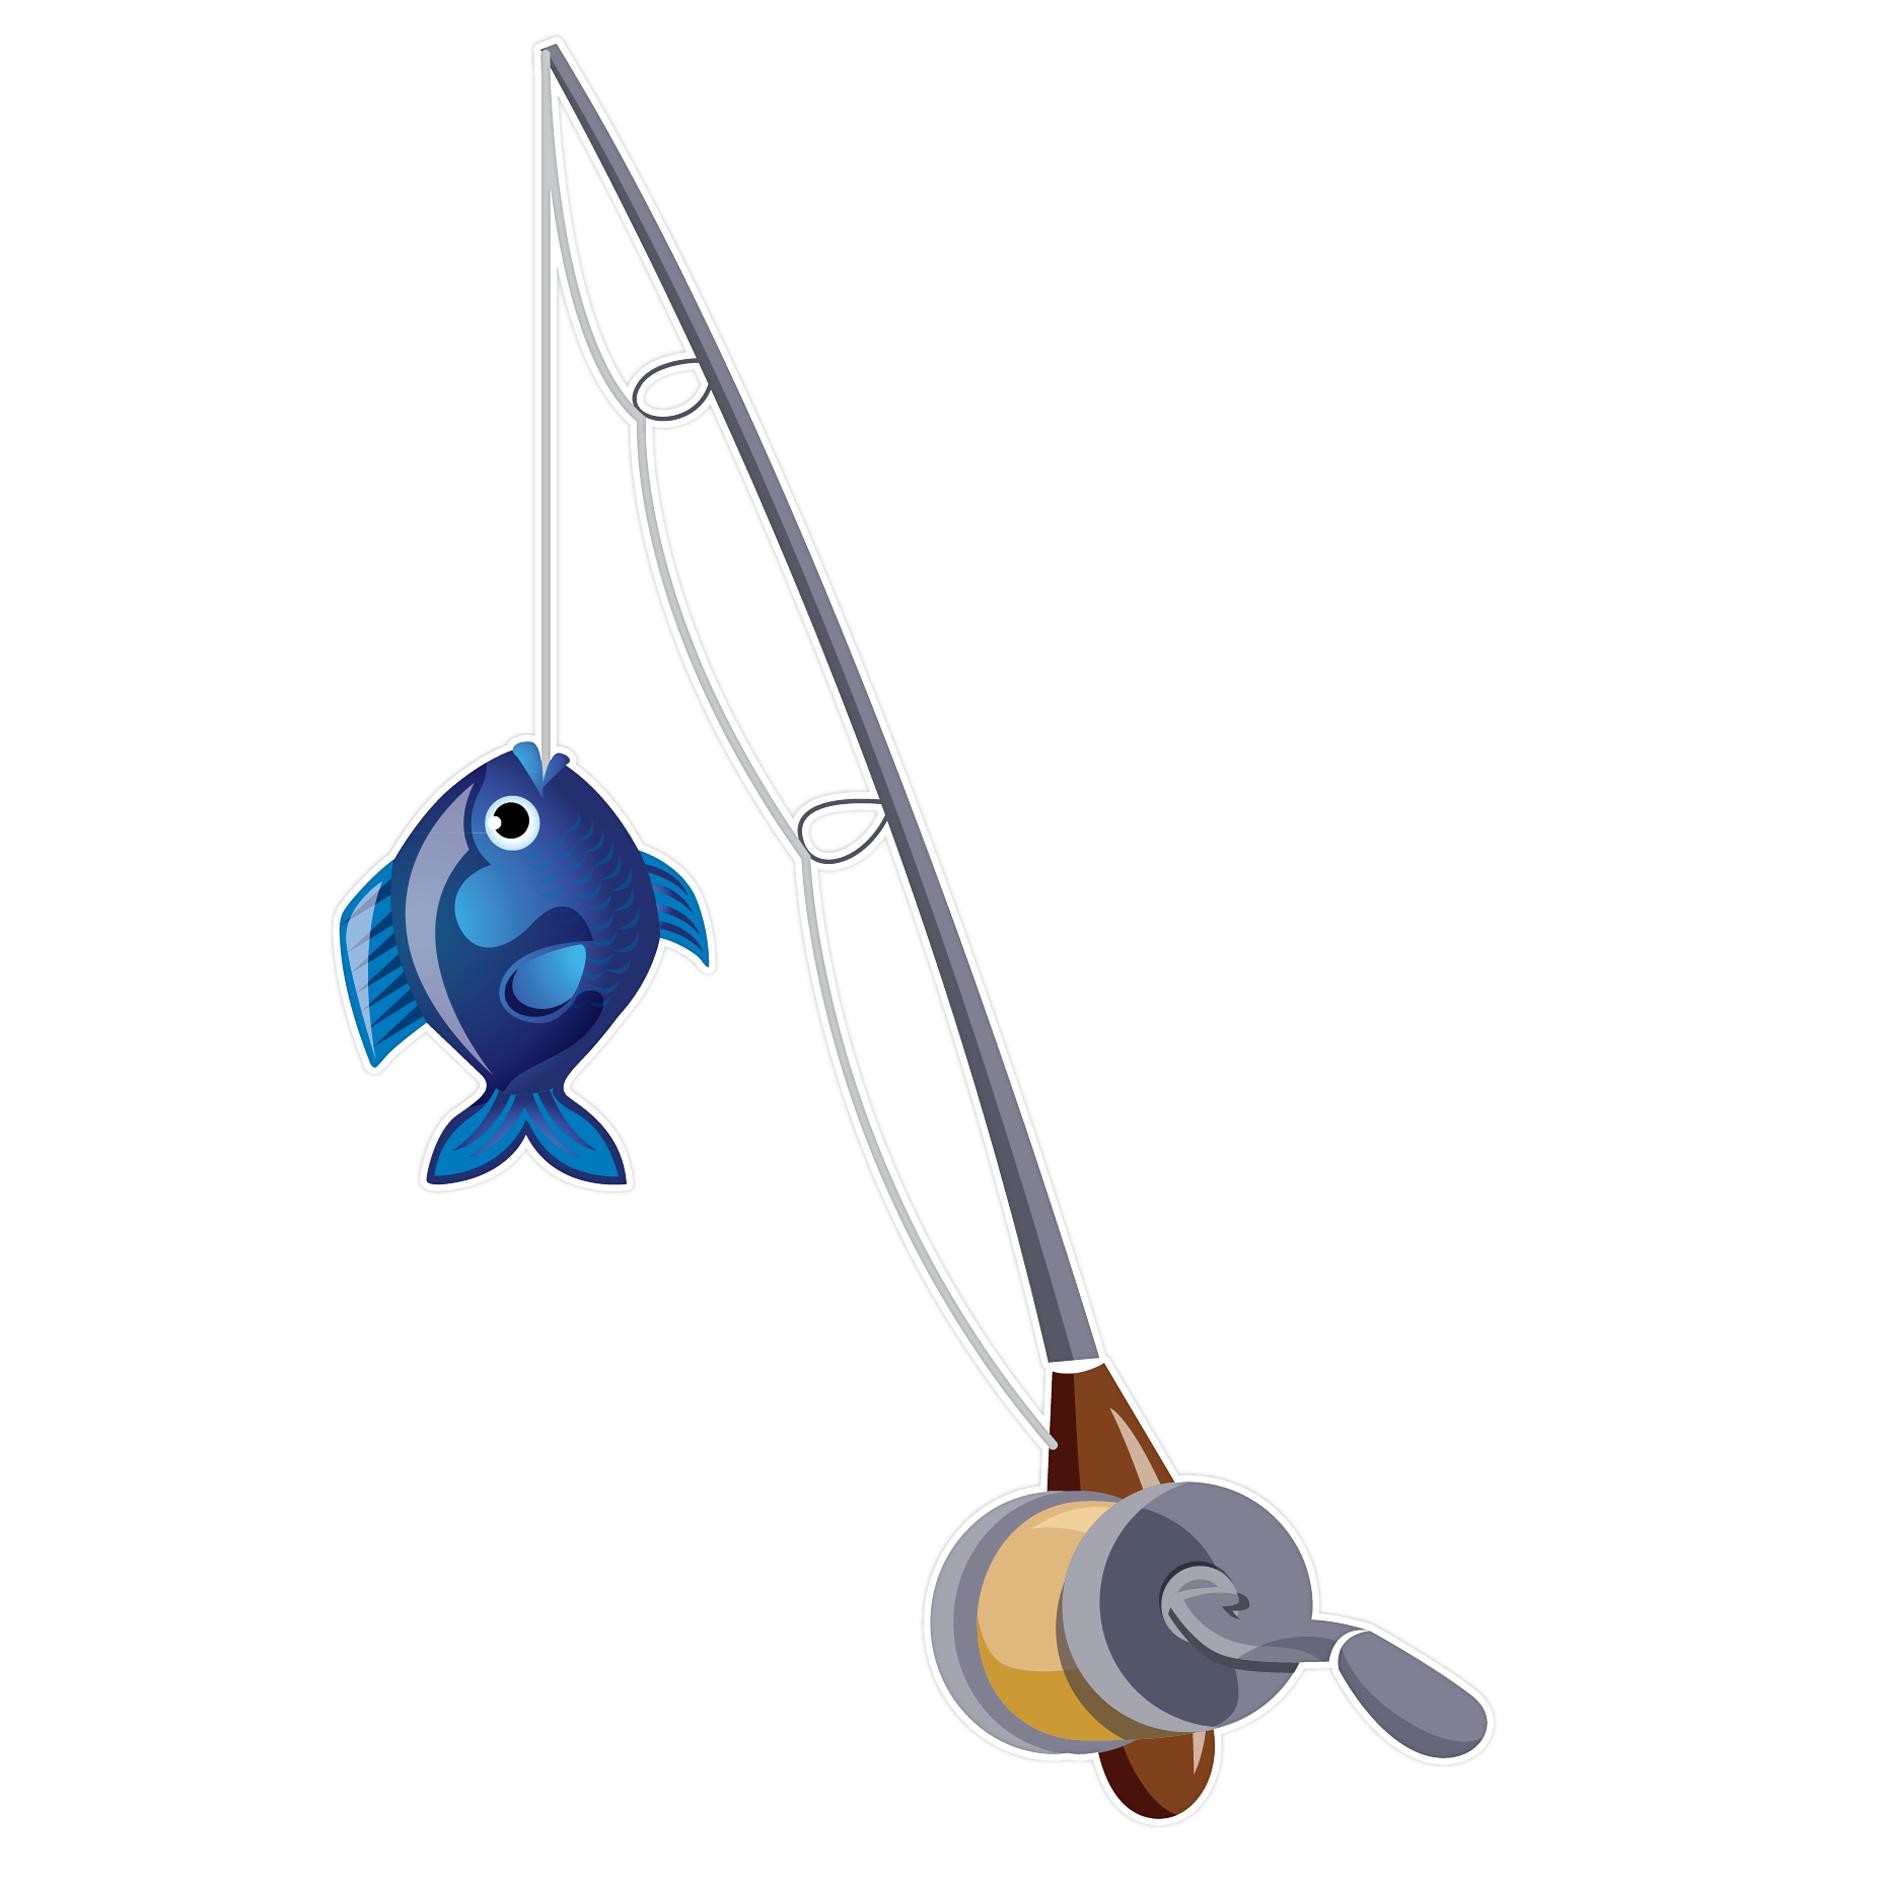 Fishing pole clipart fishing rod image 3